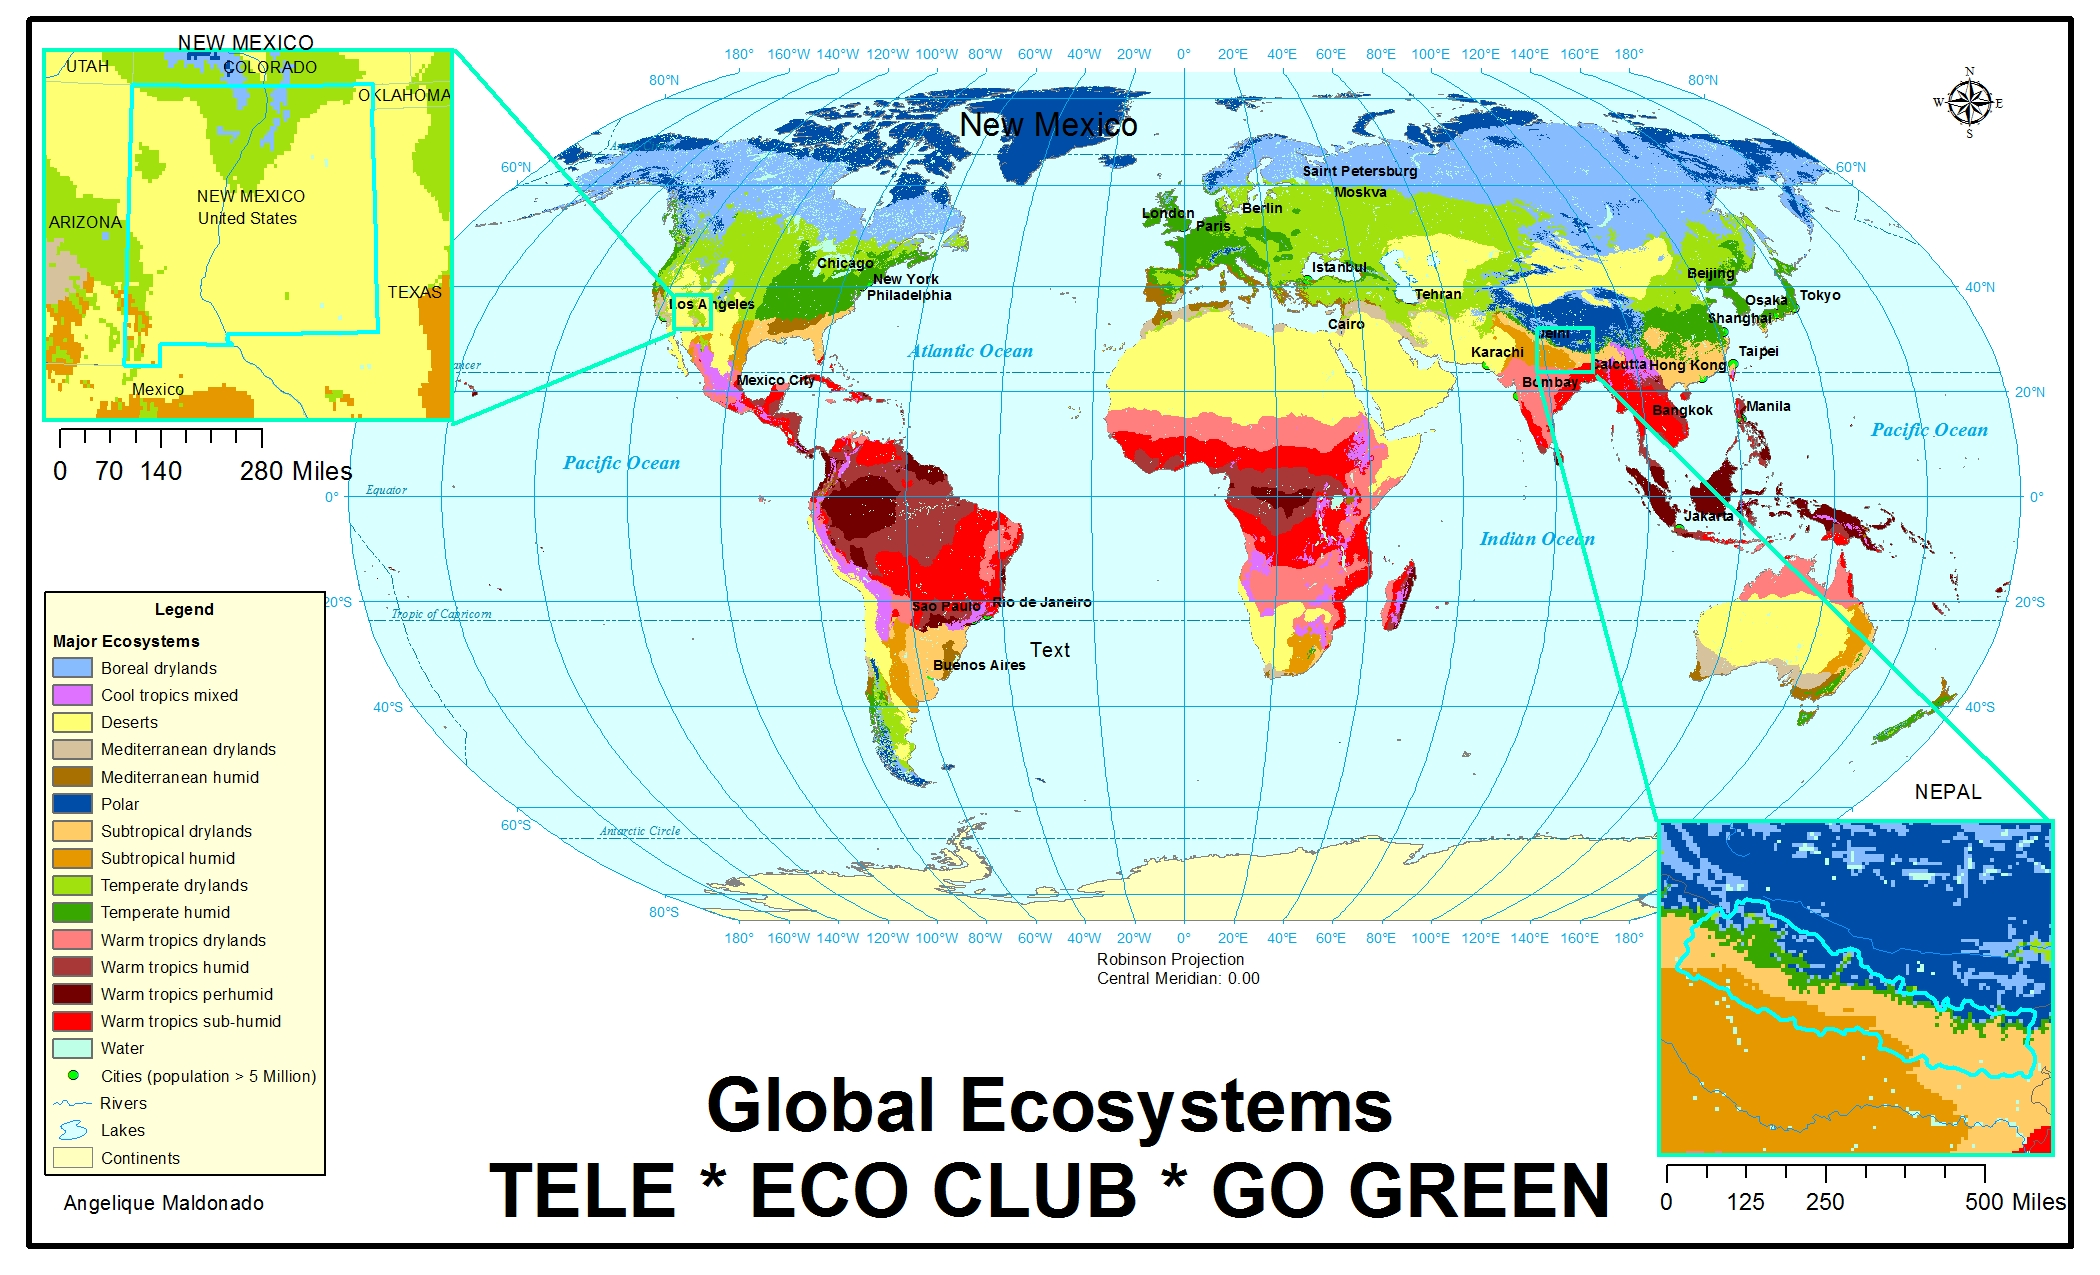 Global Ecosystems